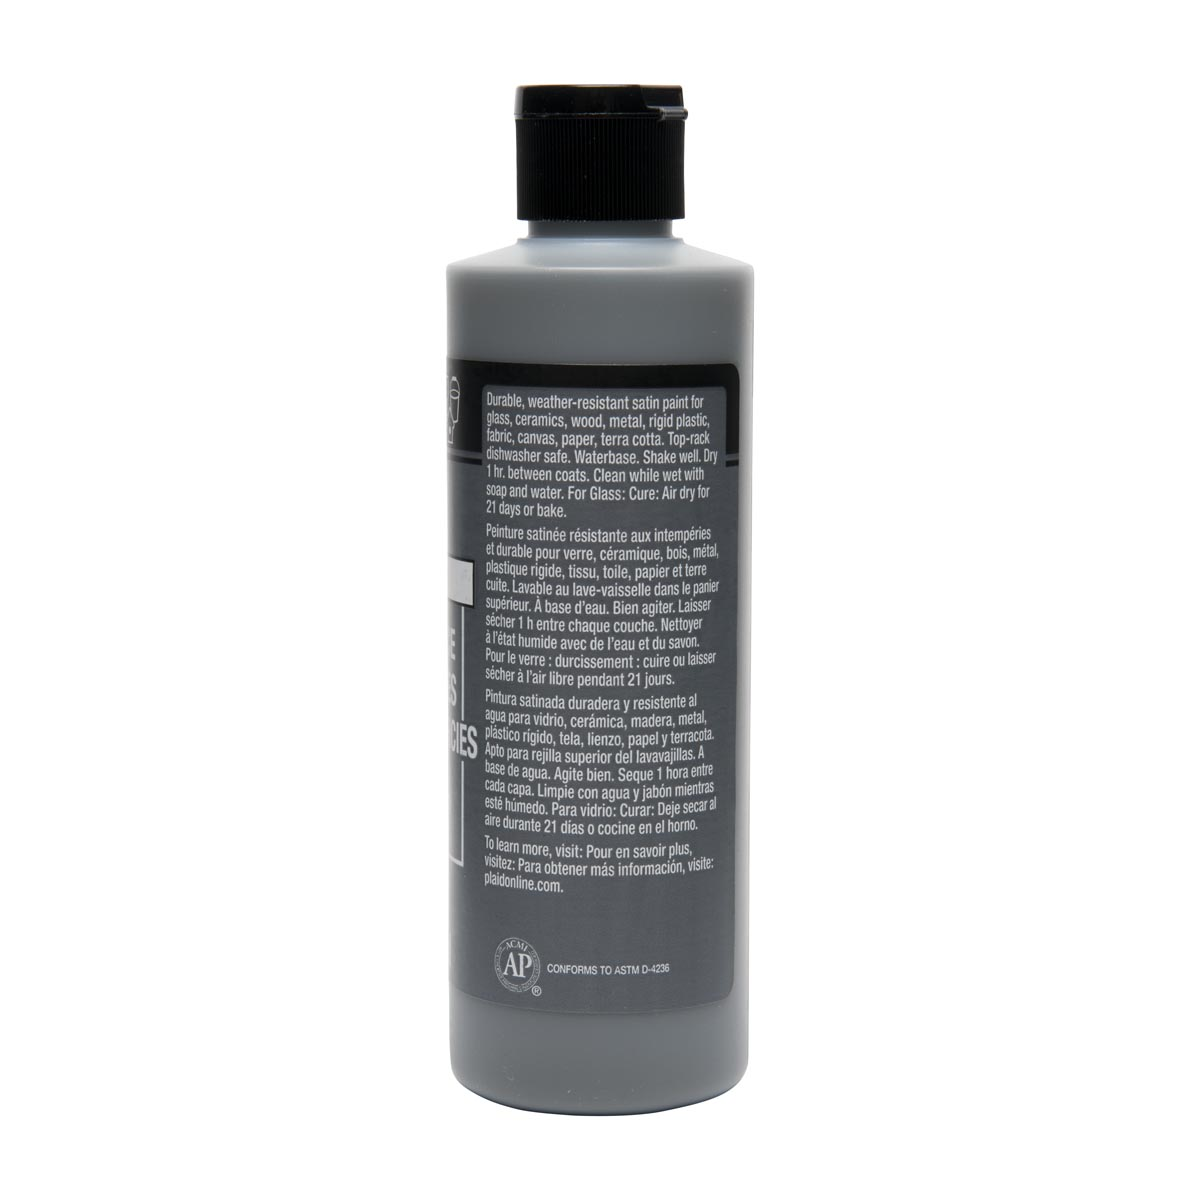 FolkArt ® Multi-Surface Satin Acrylic Paints - Medium Gray, 8 oz. - 4655